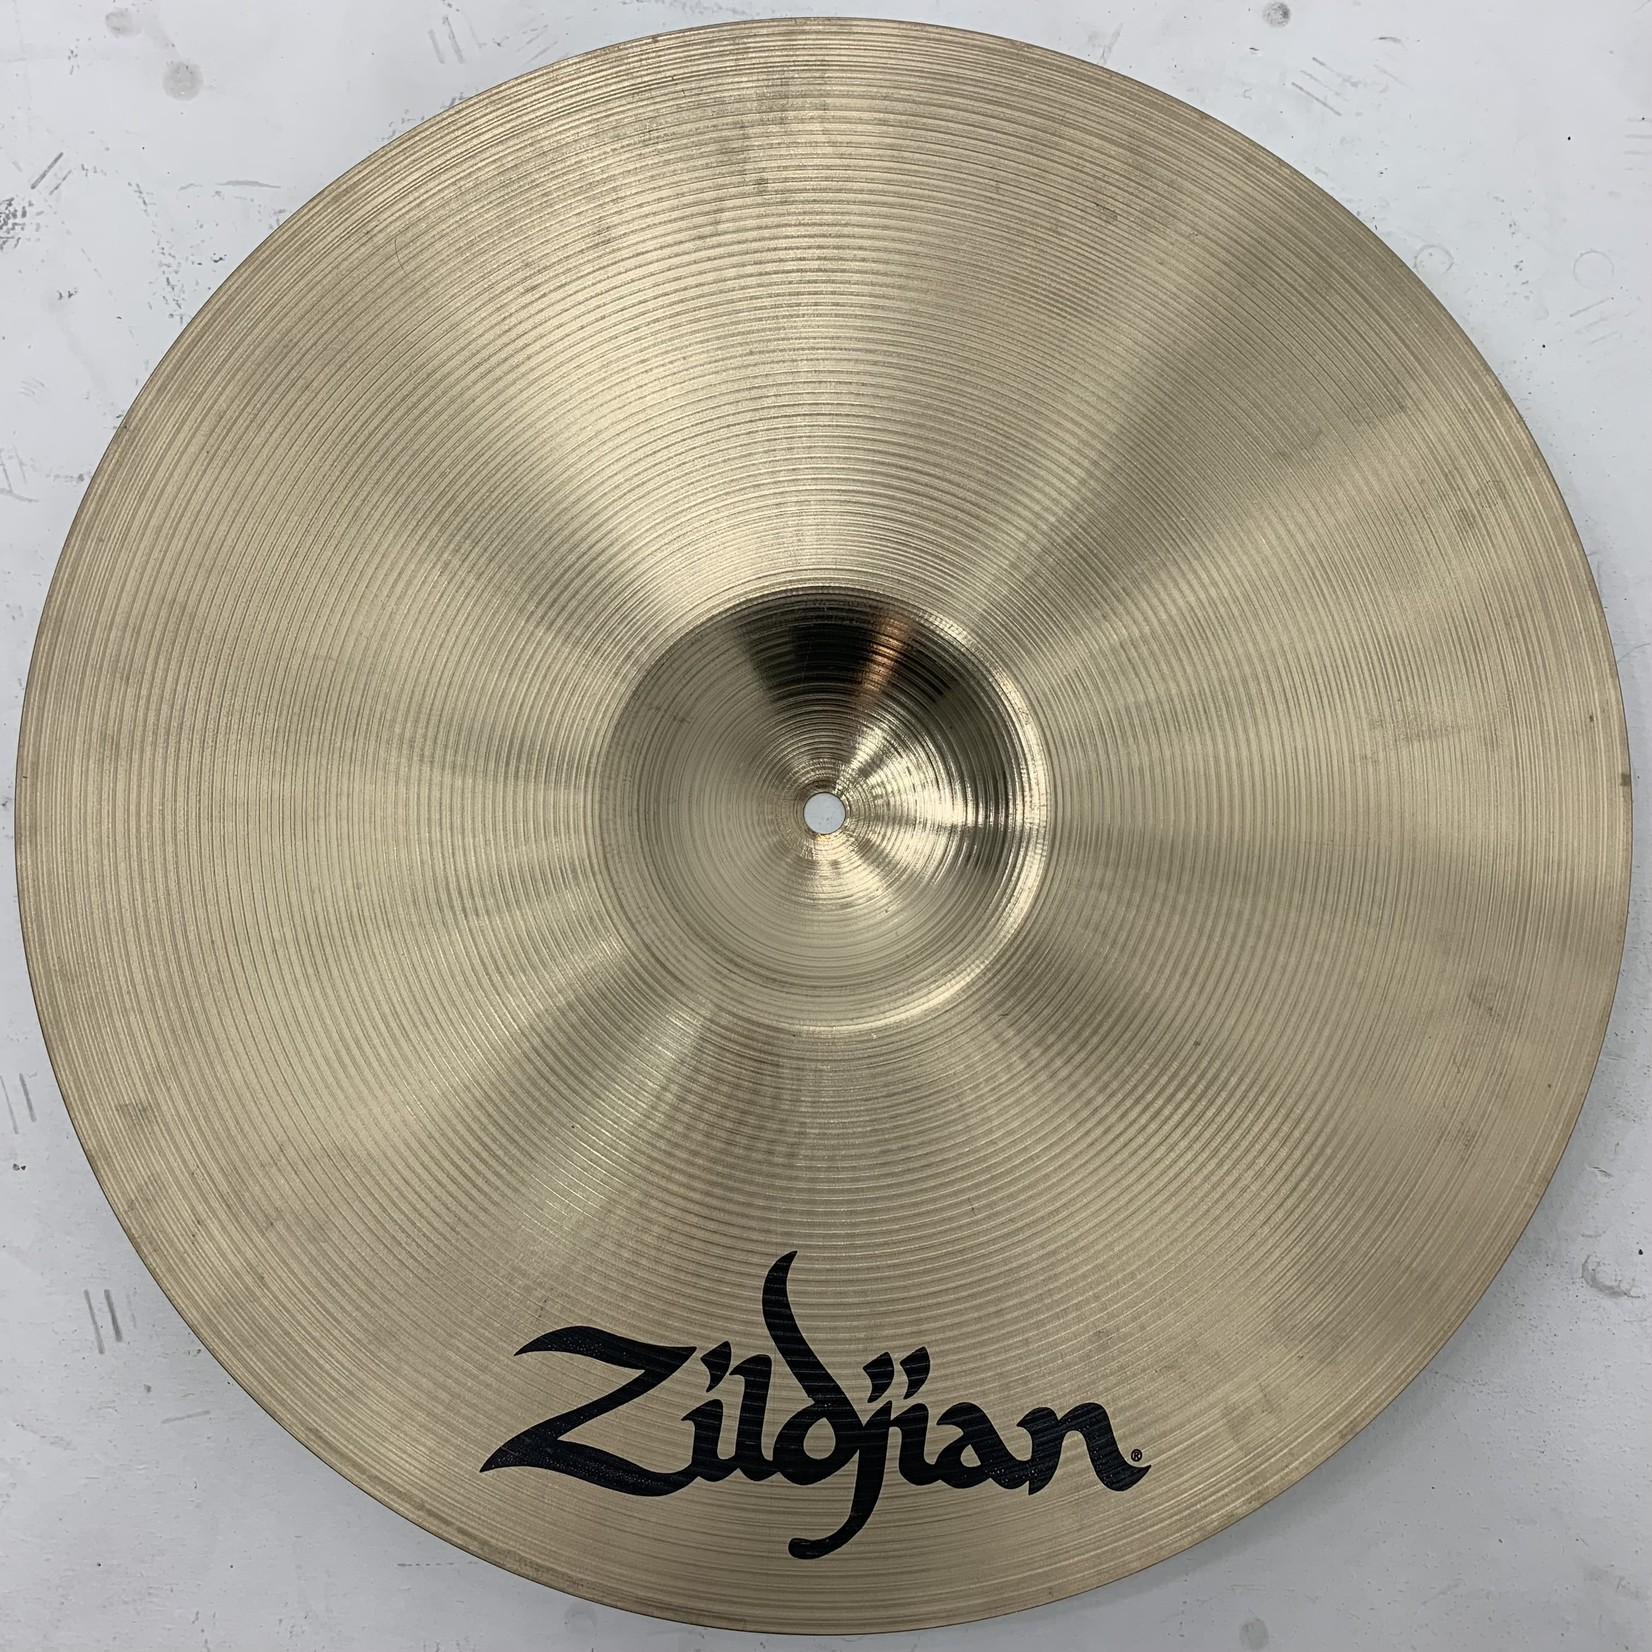 "USED Zildjian A 18"" Rock Crash Cymbal (Michael Wagener Collection)"